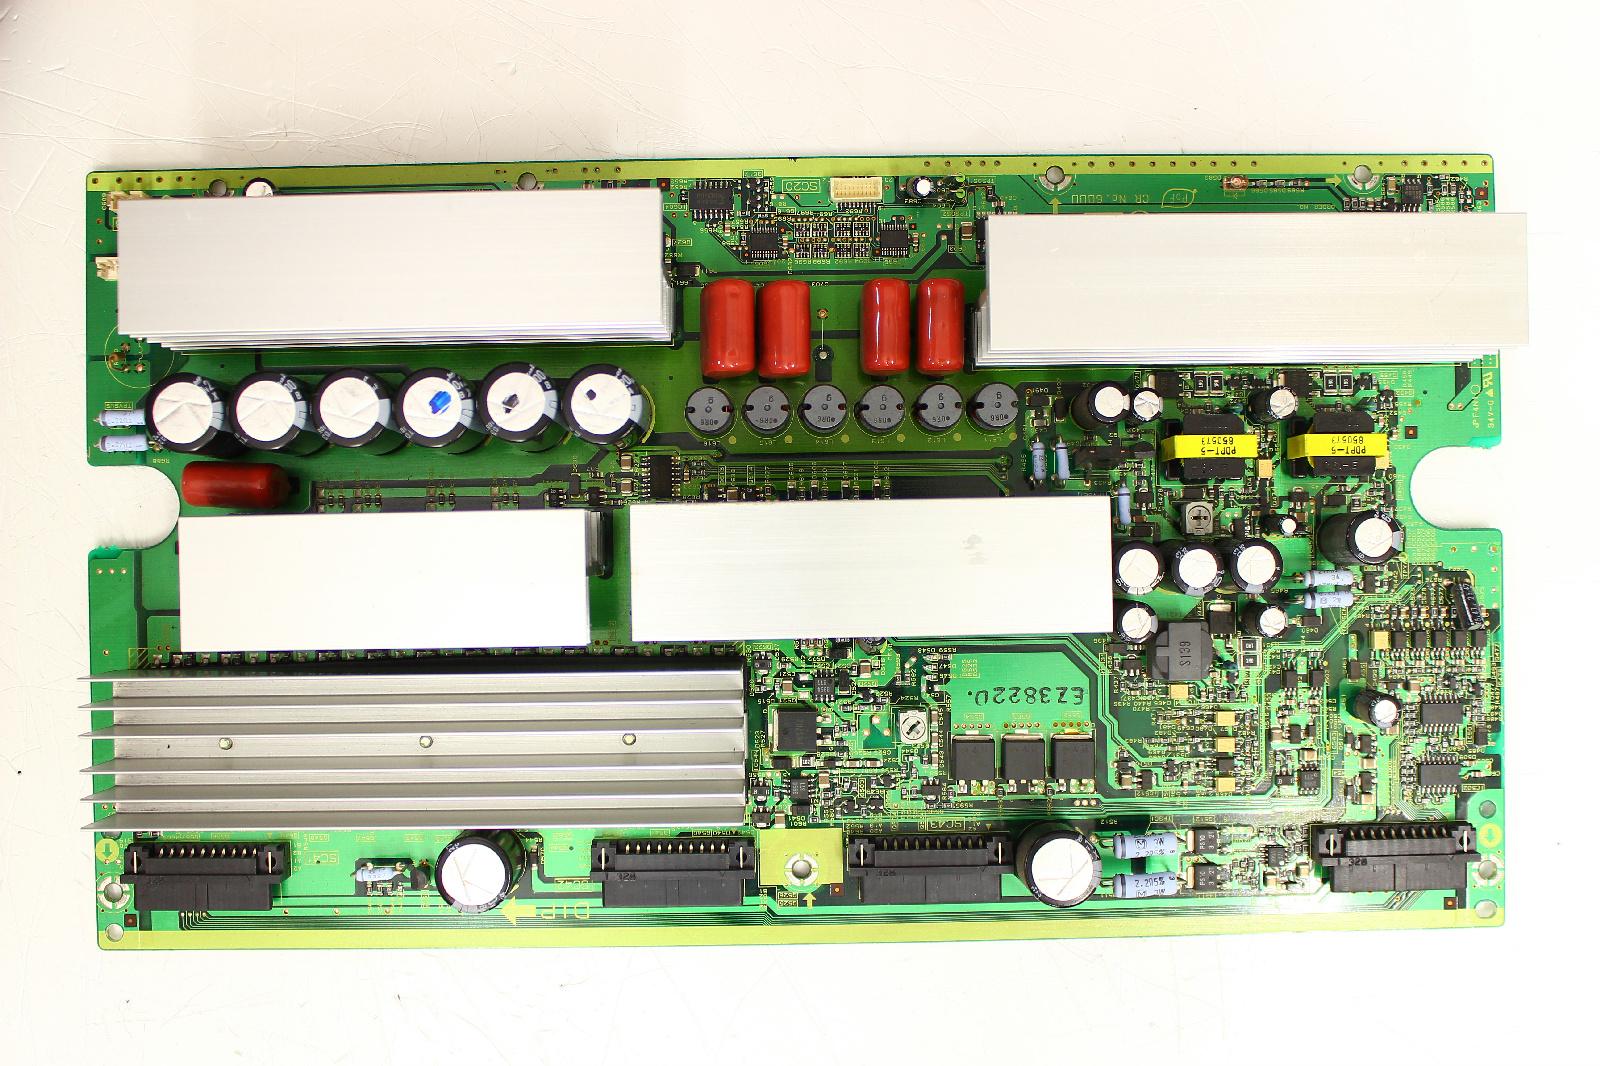 panasonic th 42px20 sc board txnsc10qjs tvparts at tvpartsinstock rh tvpartsinstock com Manual Panasonic Radio Operating Manuals Panasonic Phones